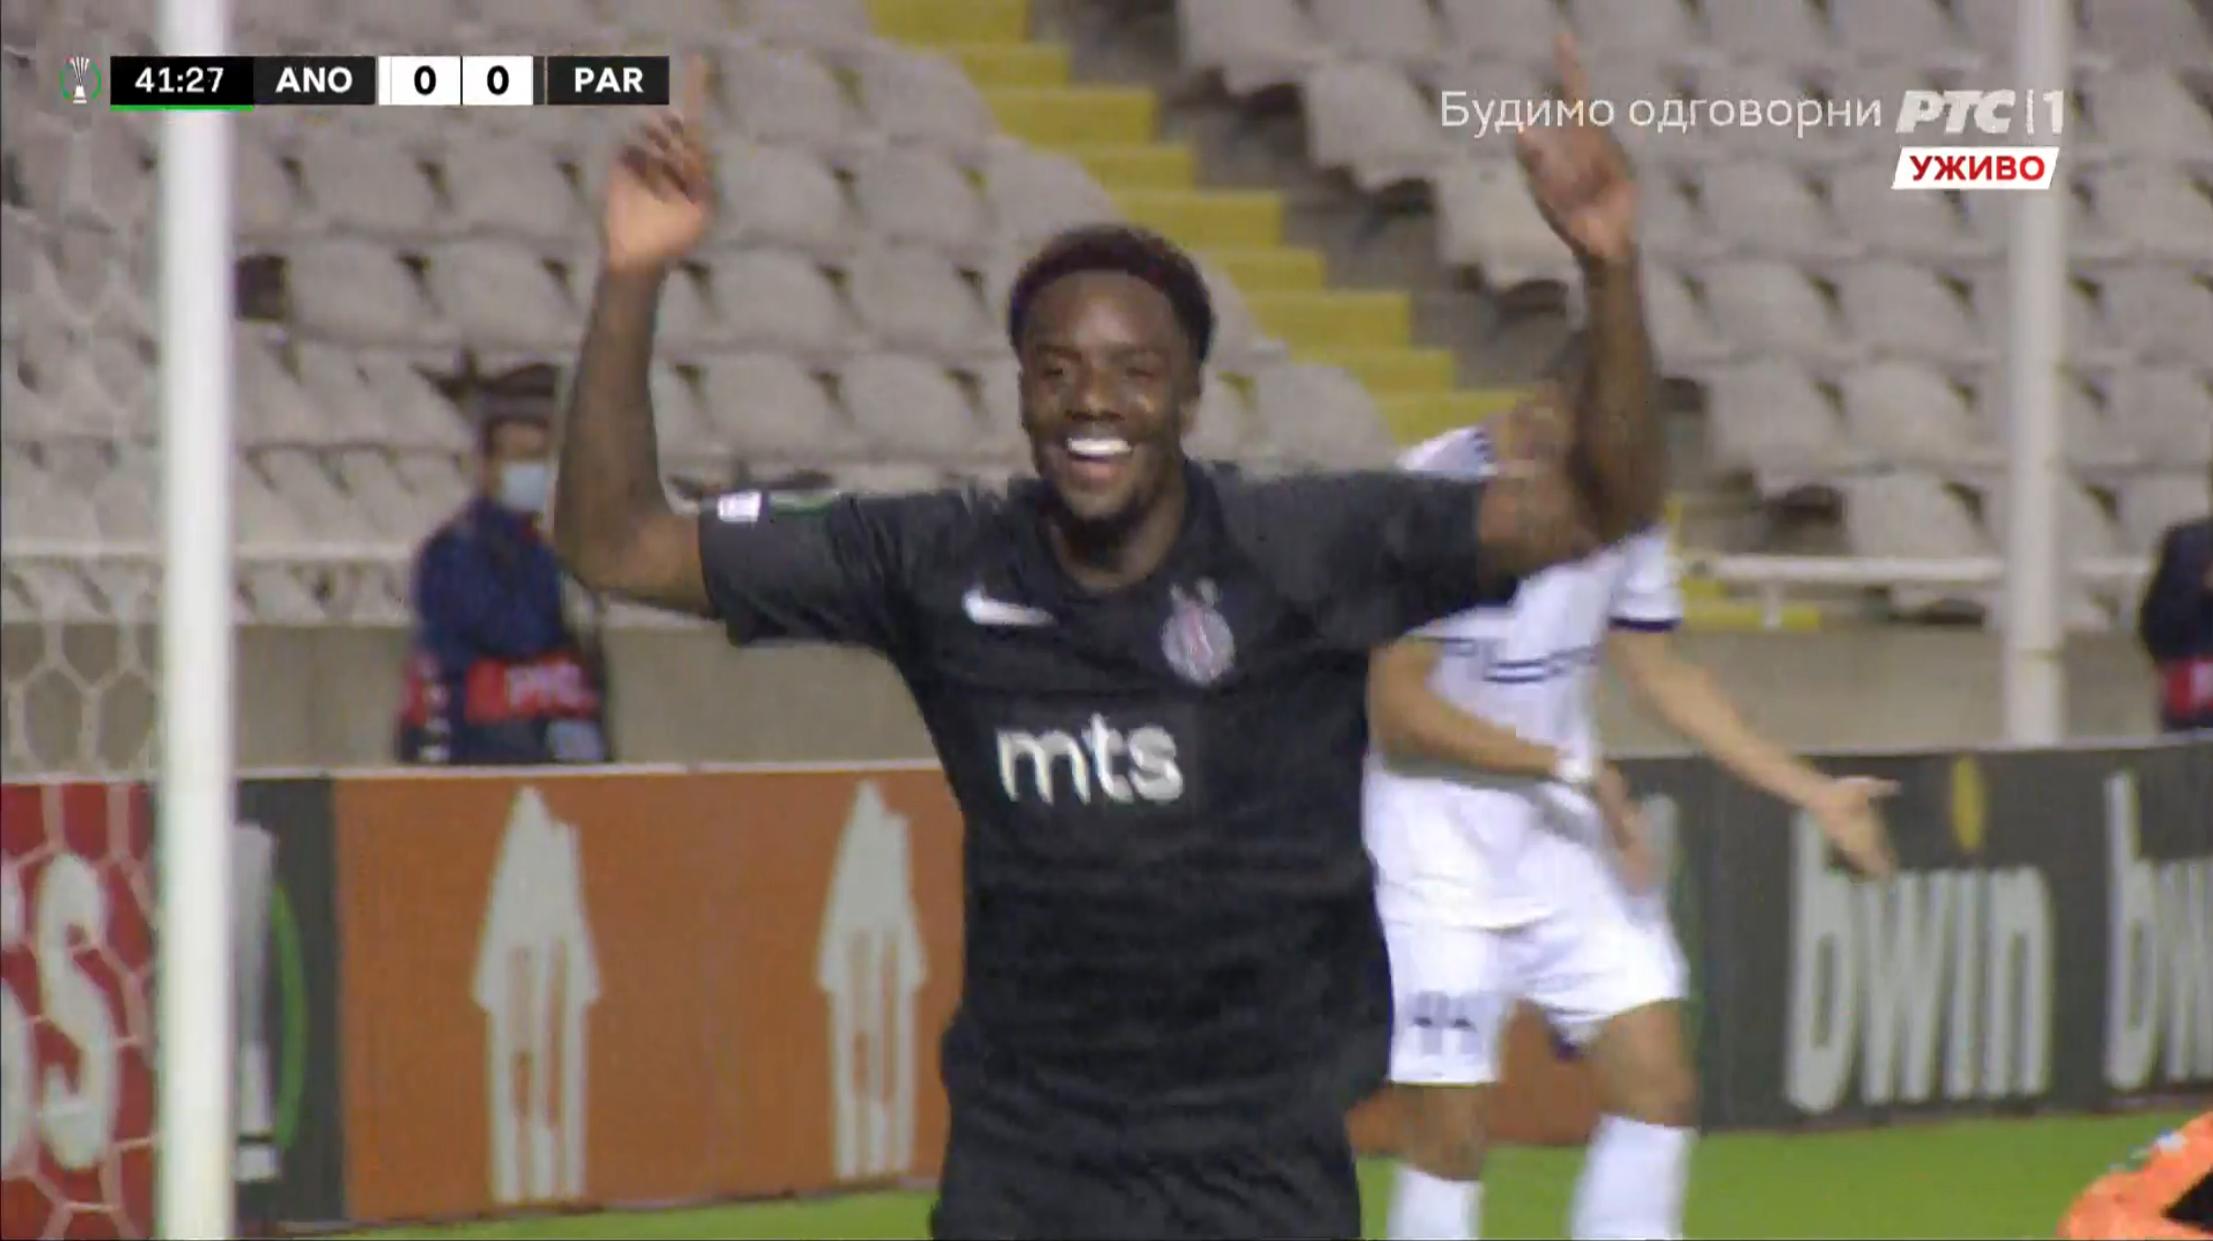 FK Partizan, Kvinsi Menig